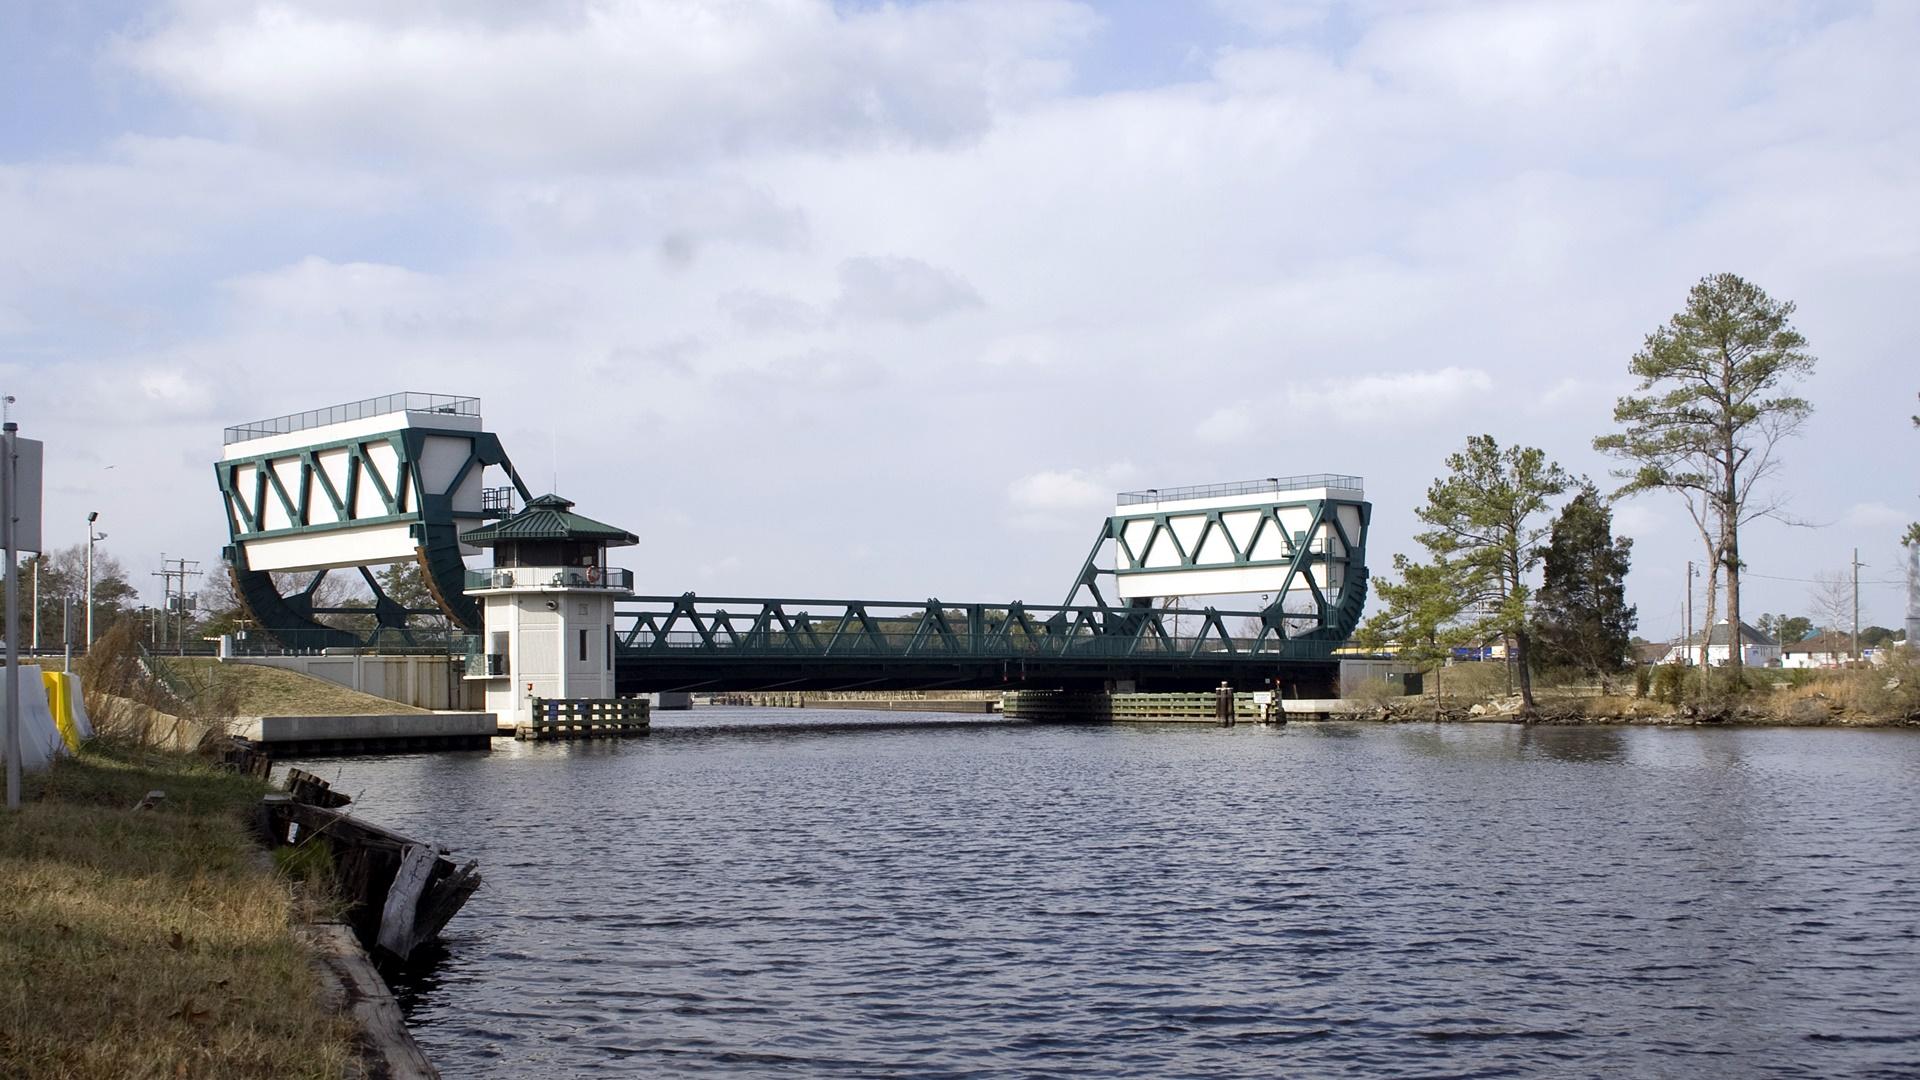 Great_Bridge,_Bridge_(080115-A-5177B-001).jpg